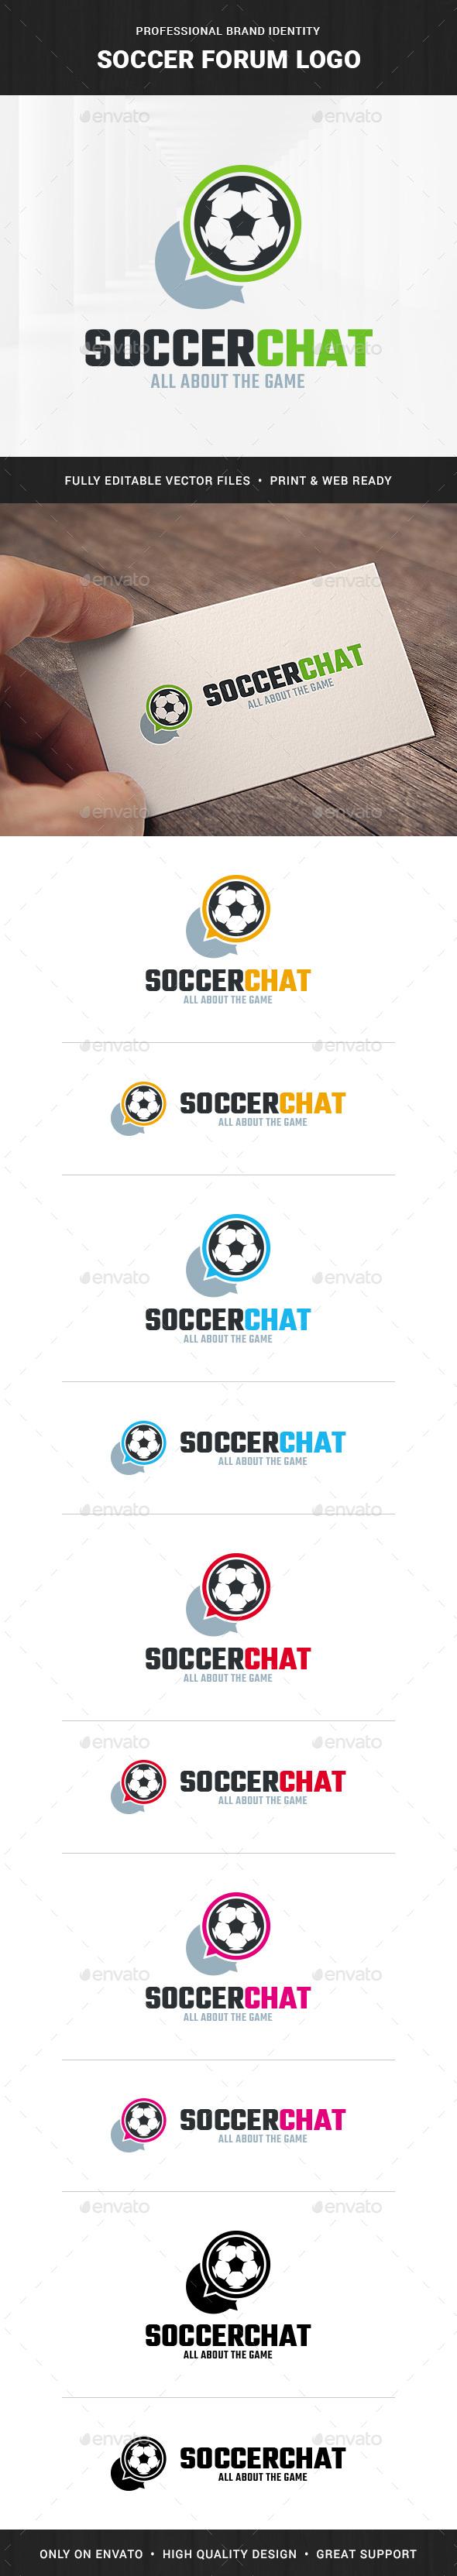 Soccer Forum Logo Template